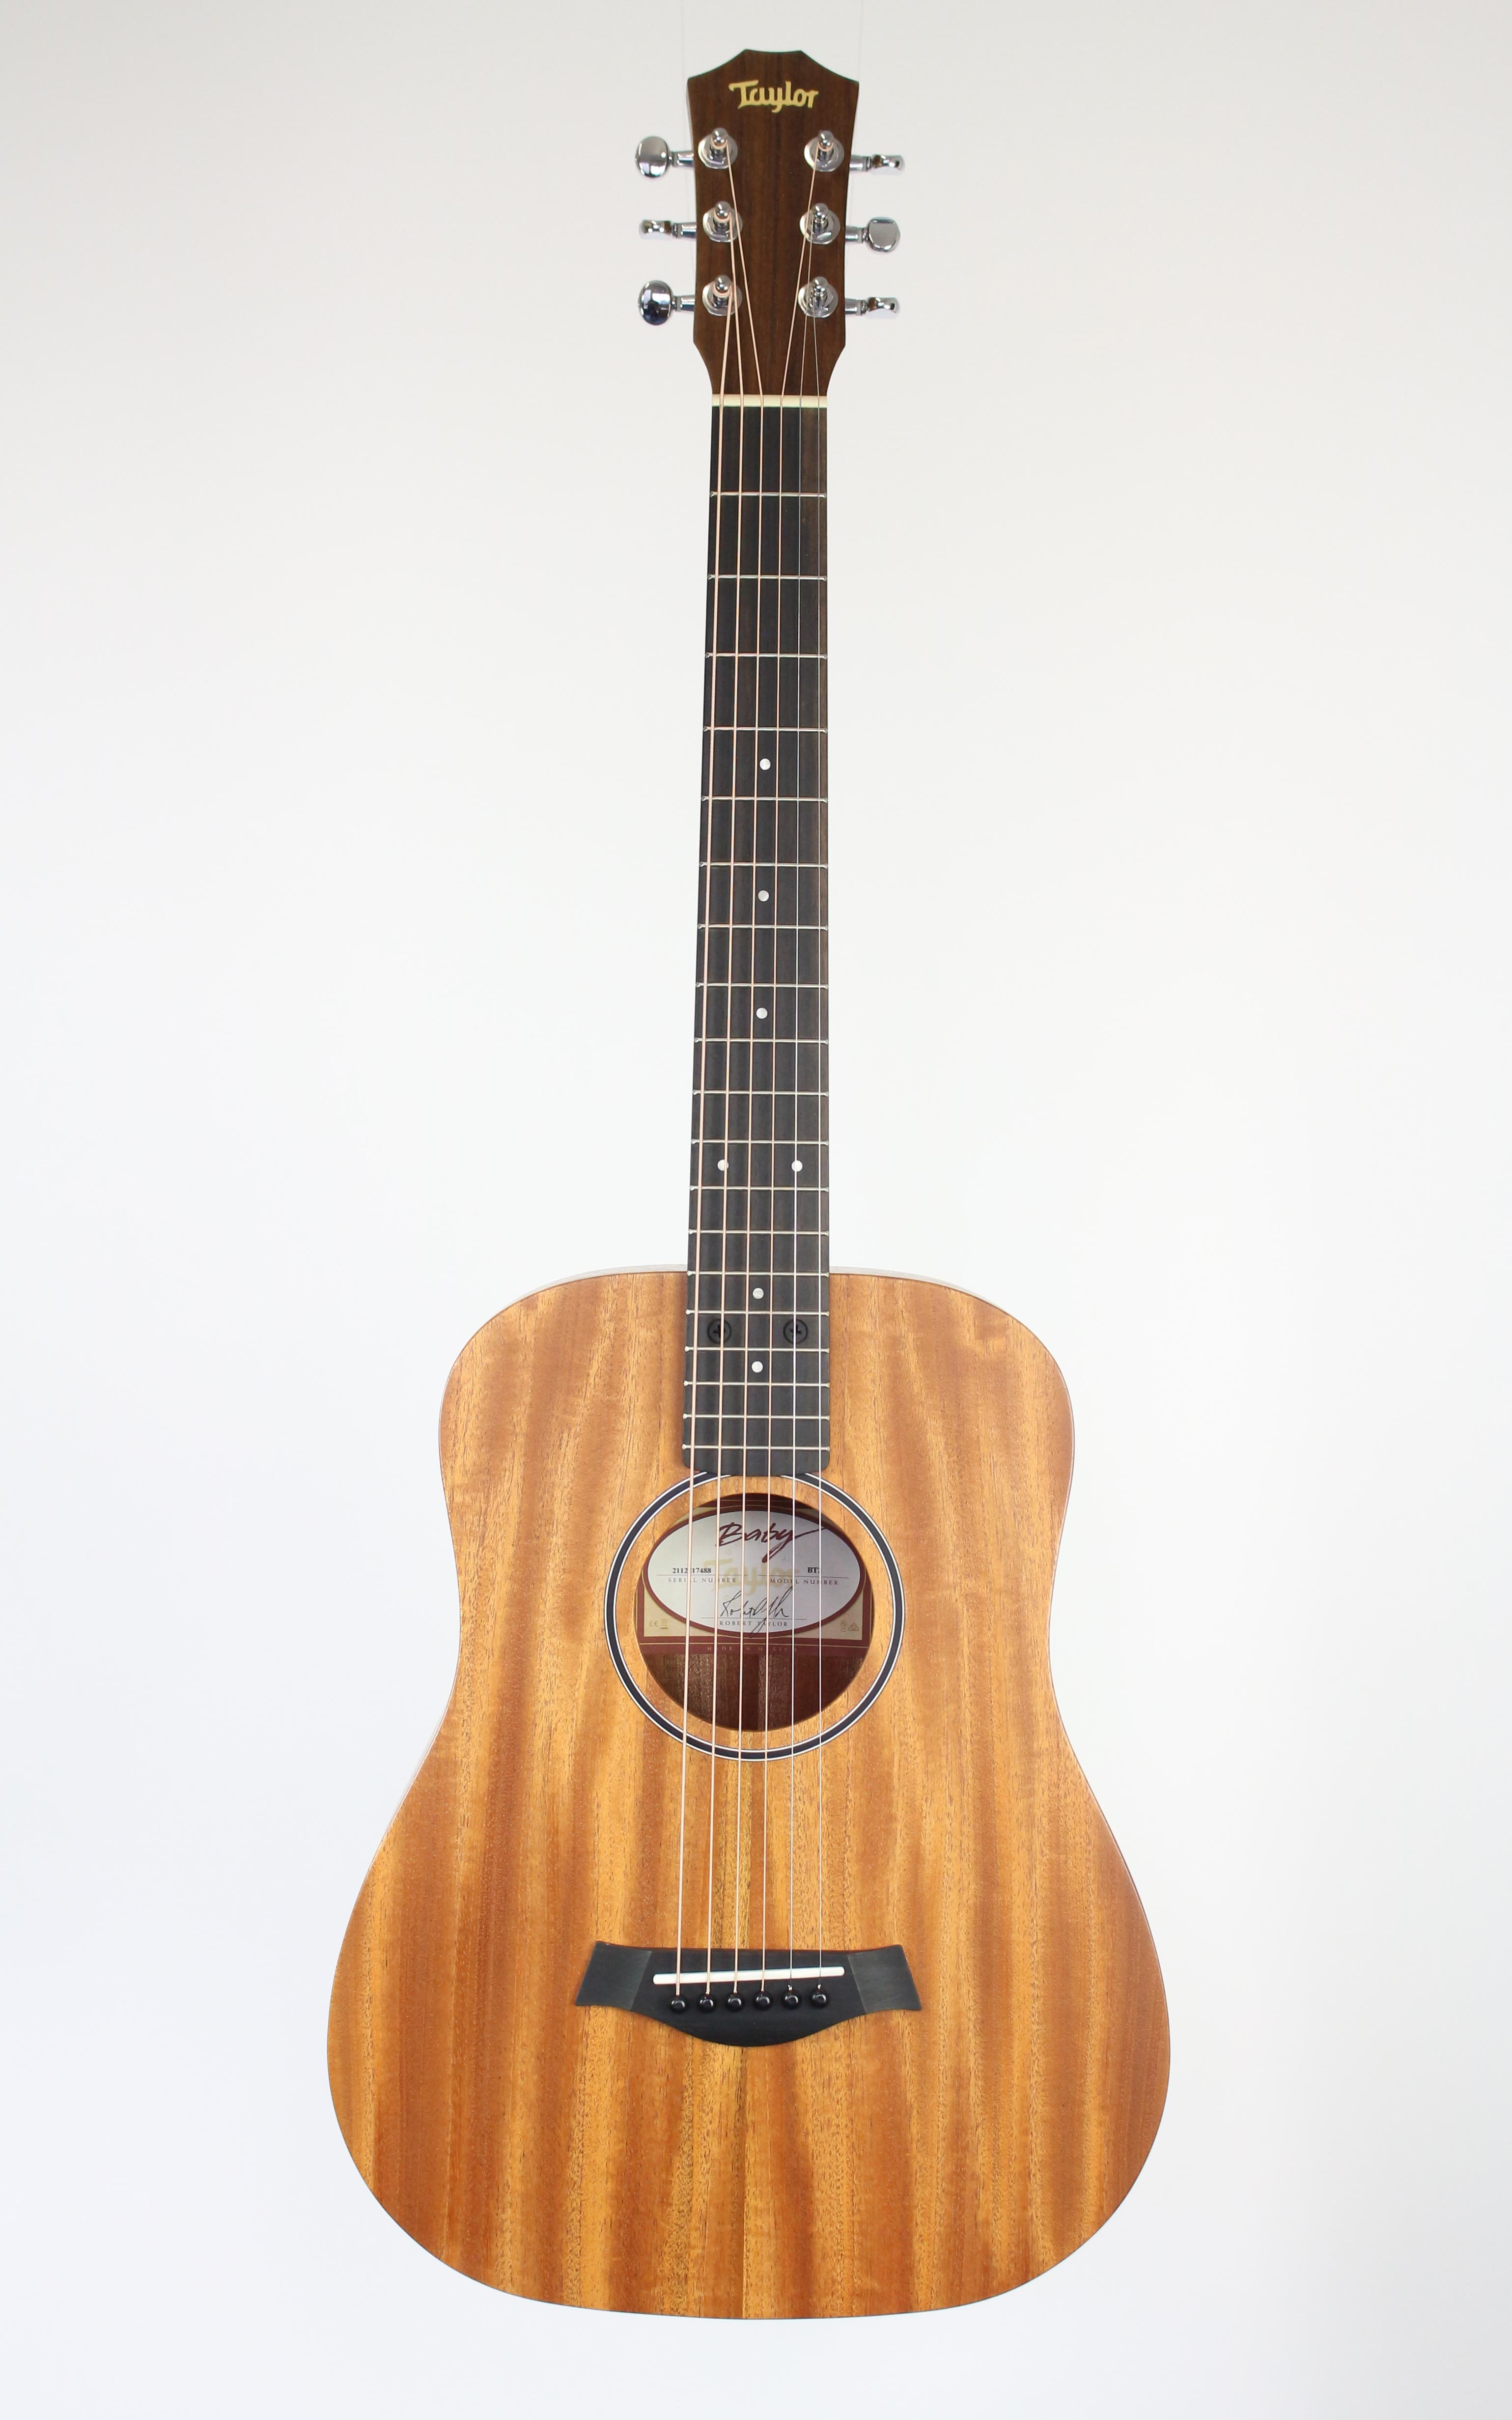 Taylor - BT2 Baby Taylor Mahogany - Gitarren - Westerngitarren   MUSIK BERTRAM Deutschland Freiburg